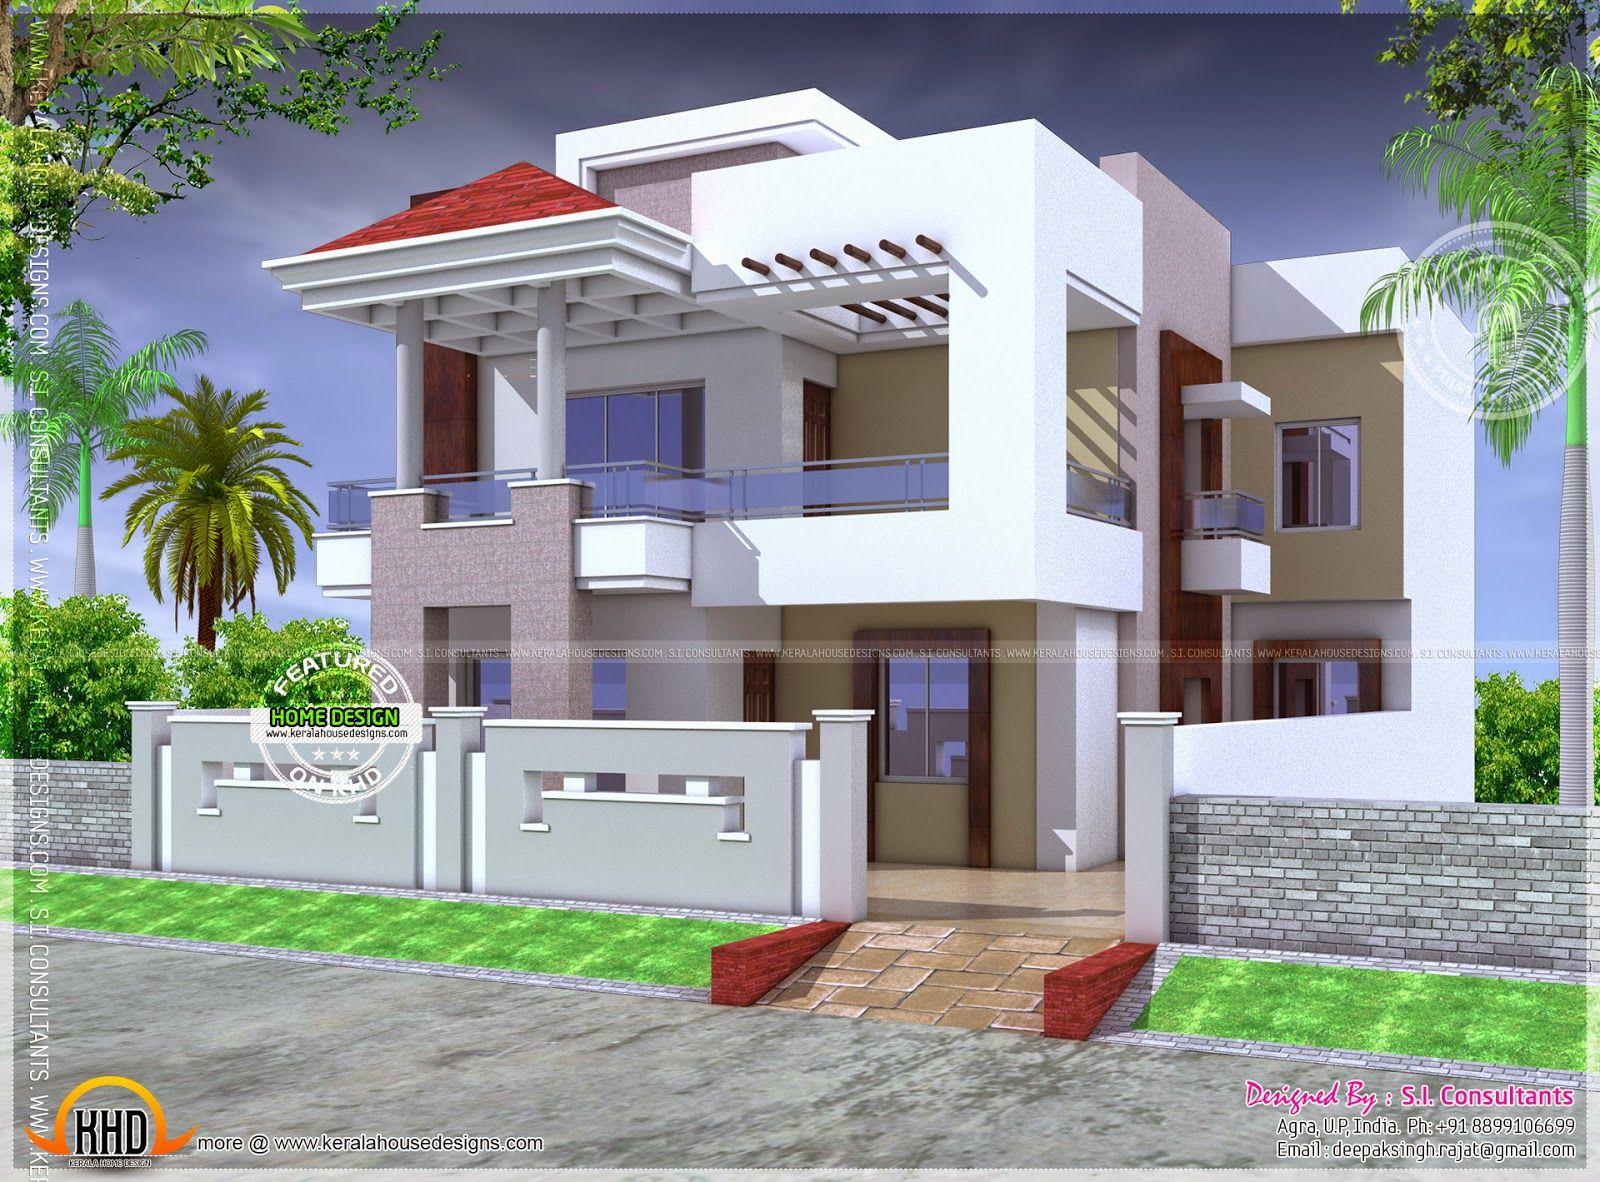 Sensational March 2014 Kerala Home Design And Floor Plans Home Rh Pinterest  Com